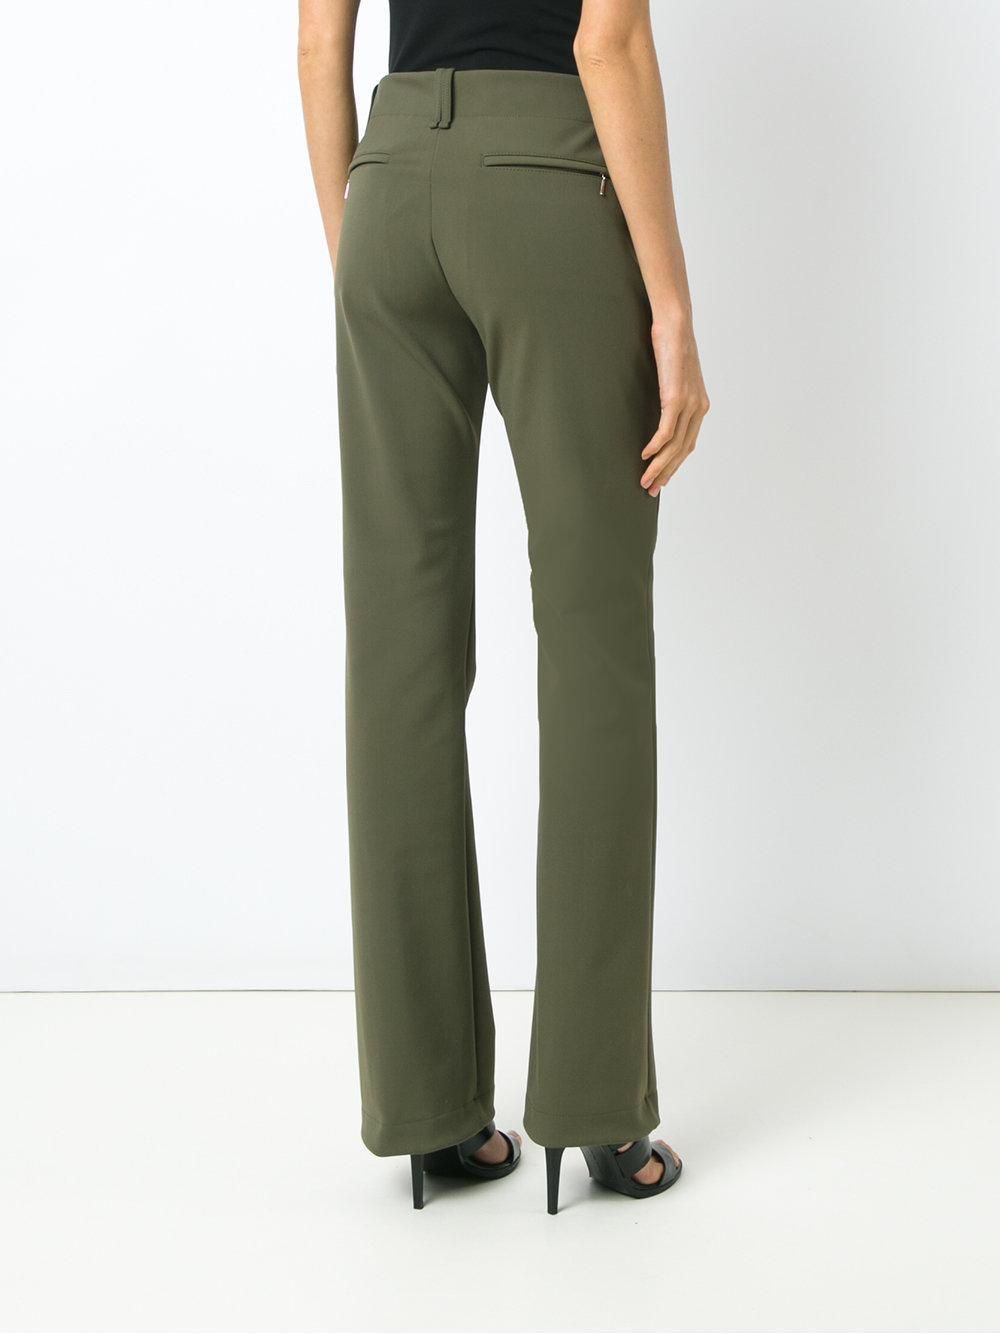 Grande Hauteur Pantalon Droite Ajustement - Vert Gloria Coelho 9uniU